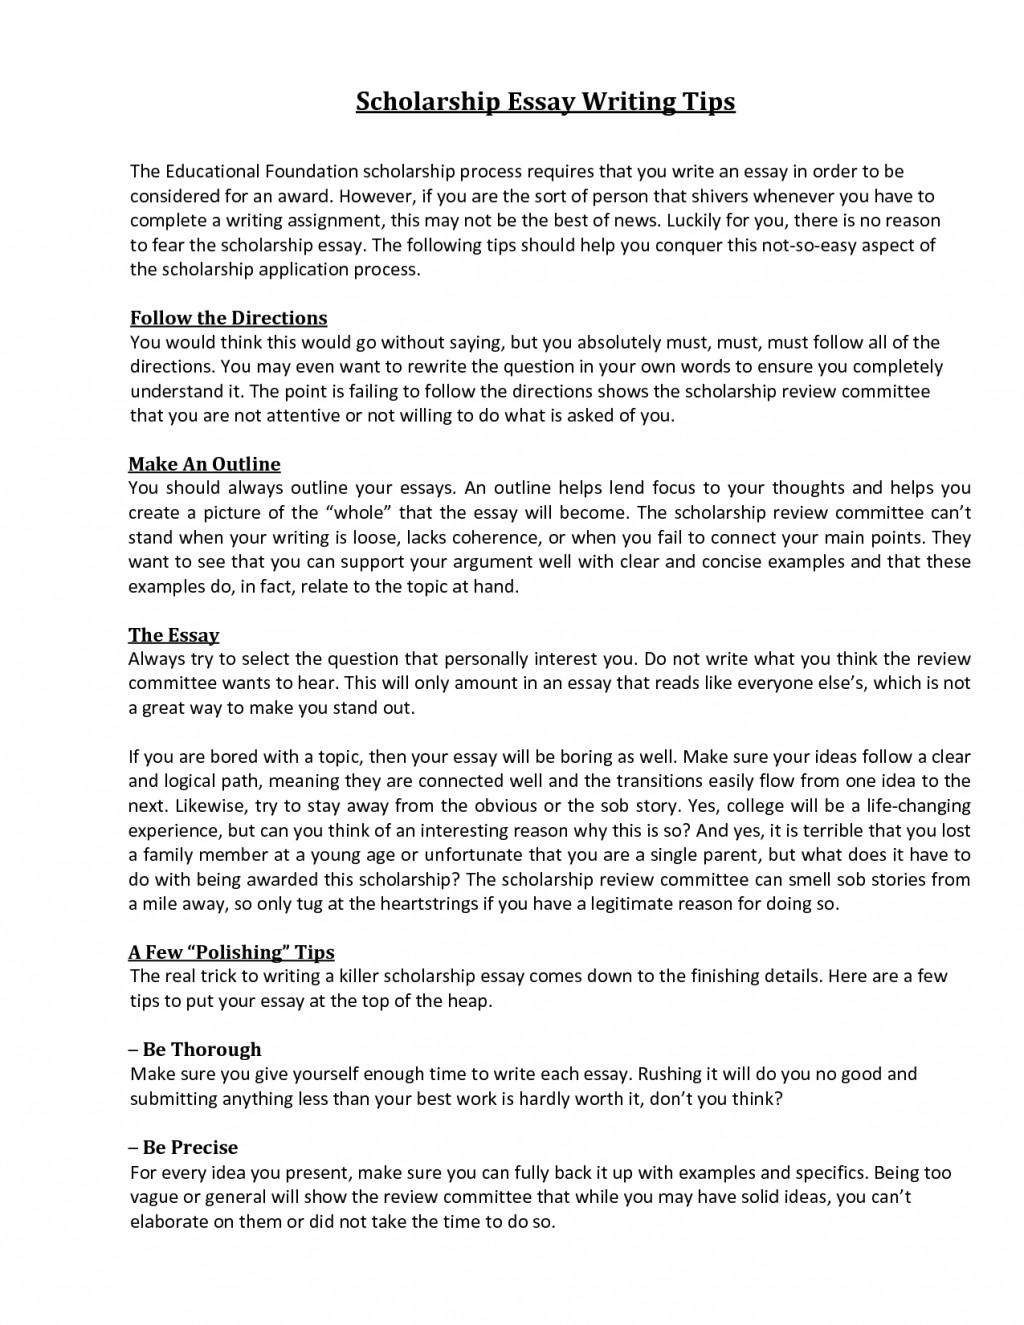 003 Example Scholarships Ziolxujgwq Phenomenal Scholarship Essays Sample For Masters 500 Words Nursing Large